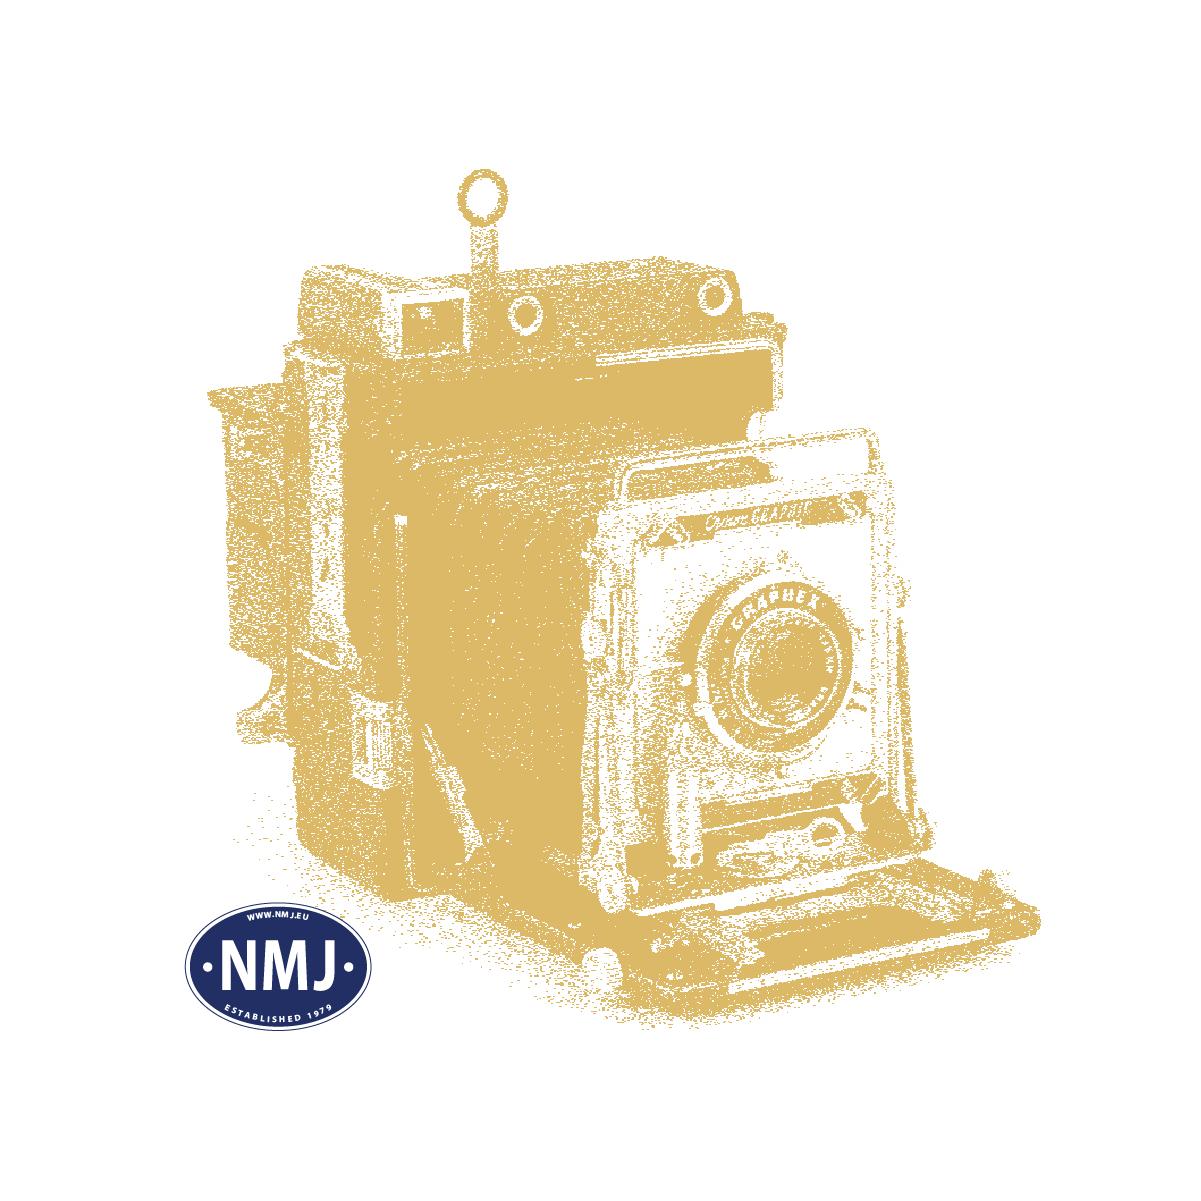 NMJT82.303 - NMJ Topline NSB El13.2139, DC, rot/silber